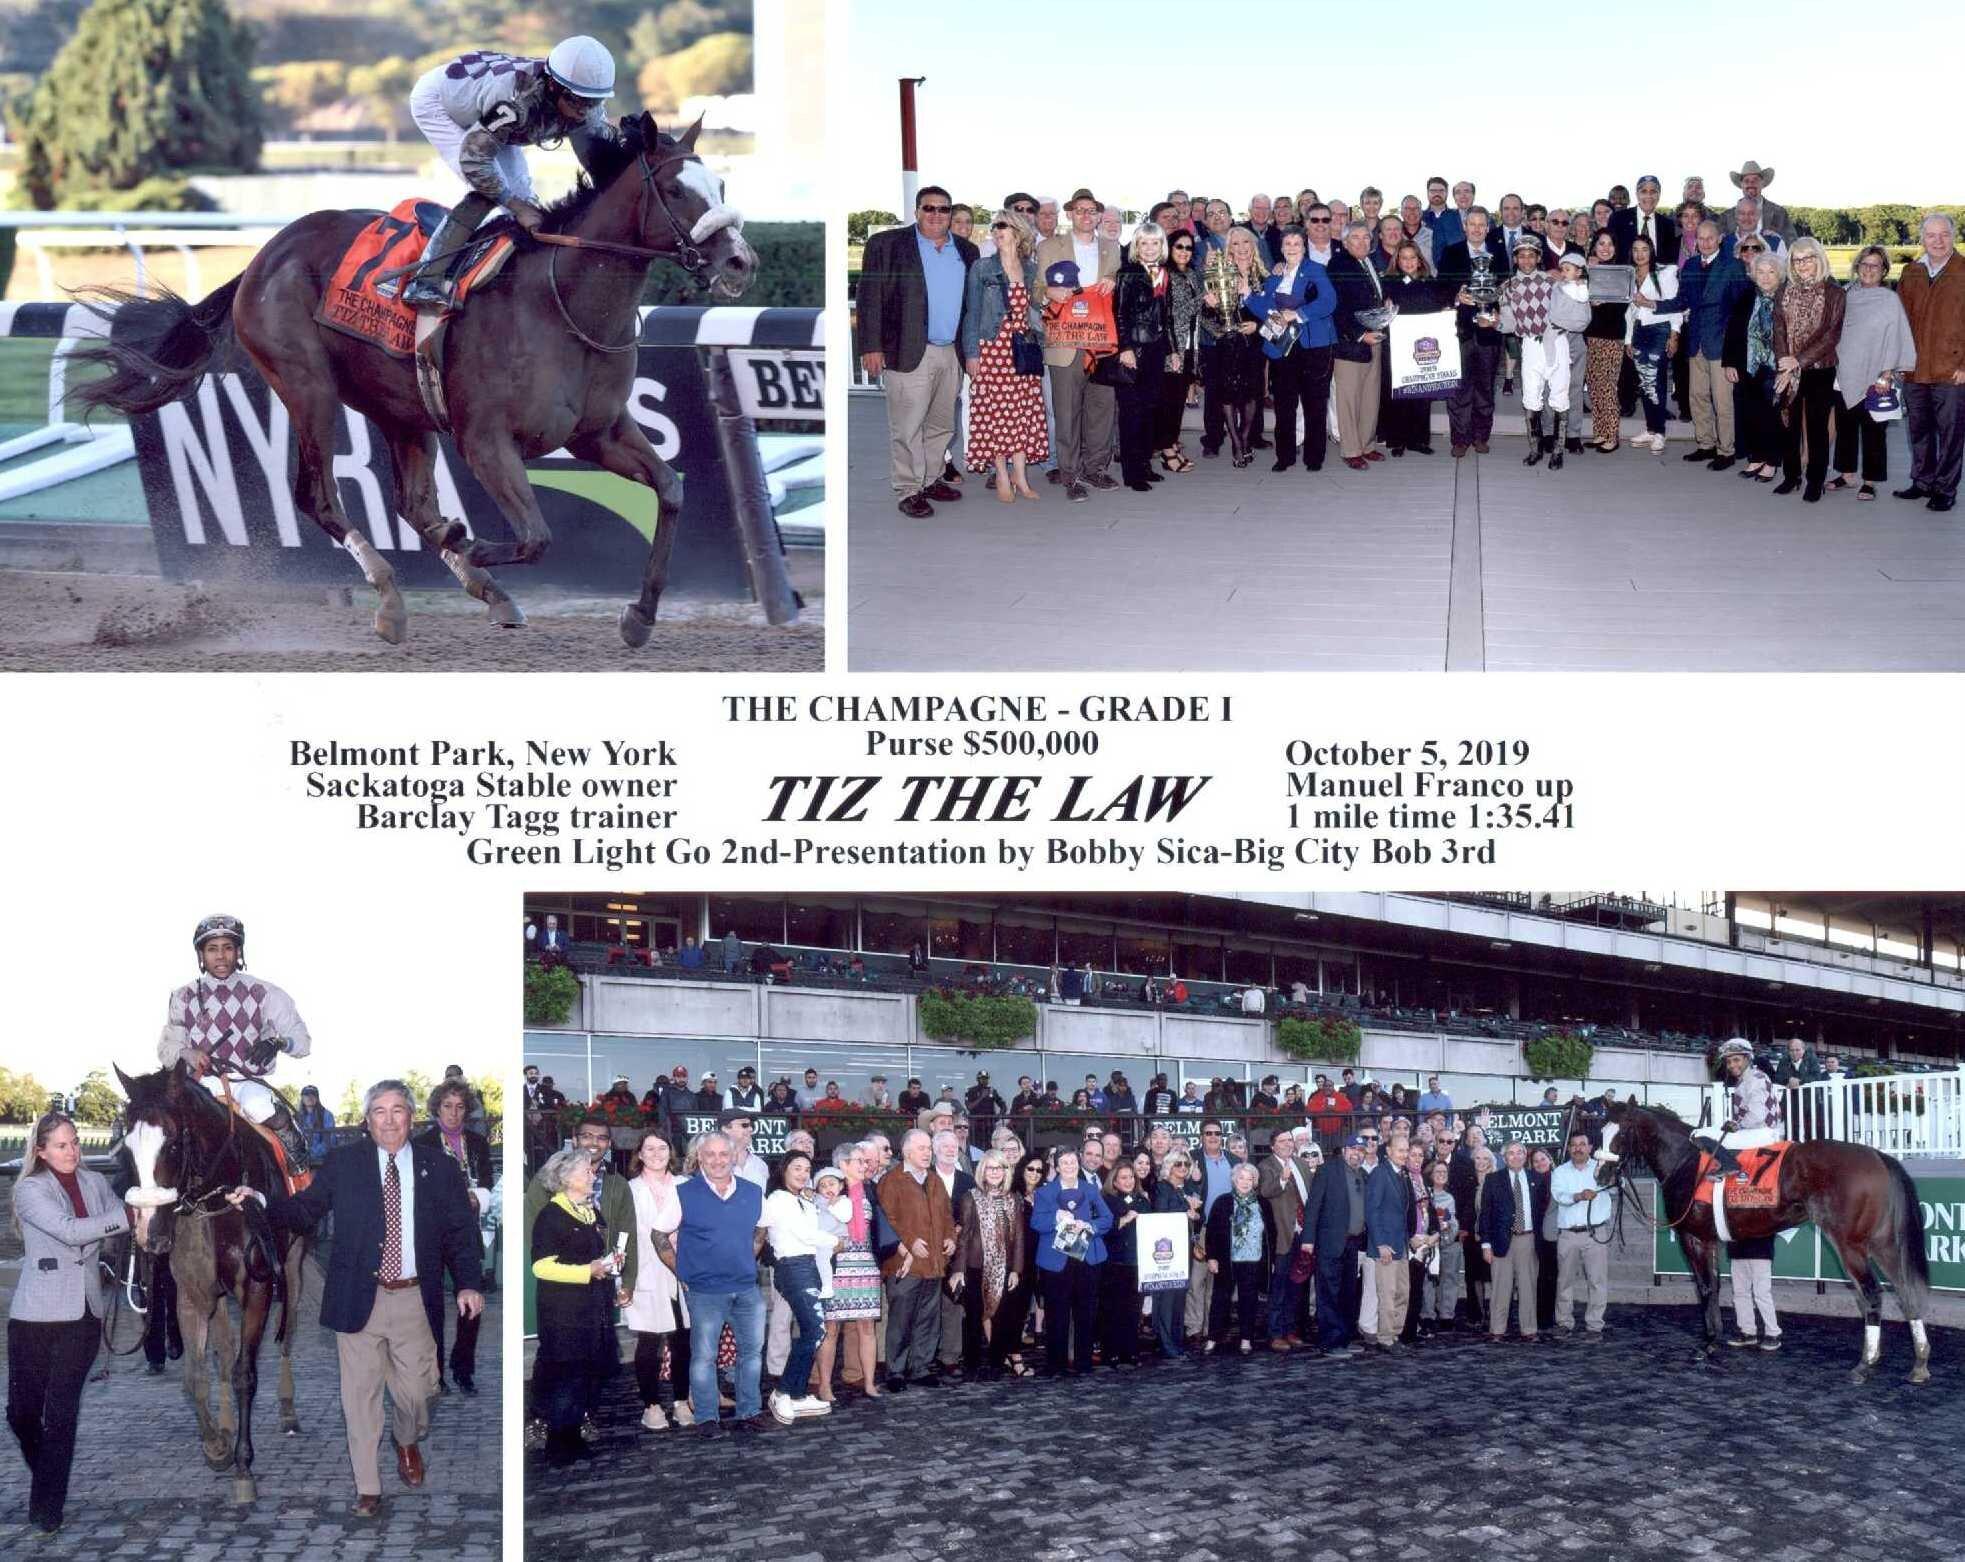 Tiz the Law - 1 st Place Belmont Grade 1 Champagne - 10-5-2019.jpg